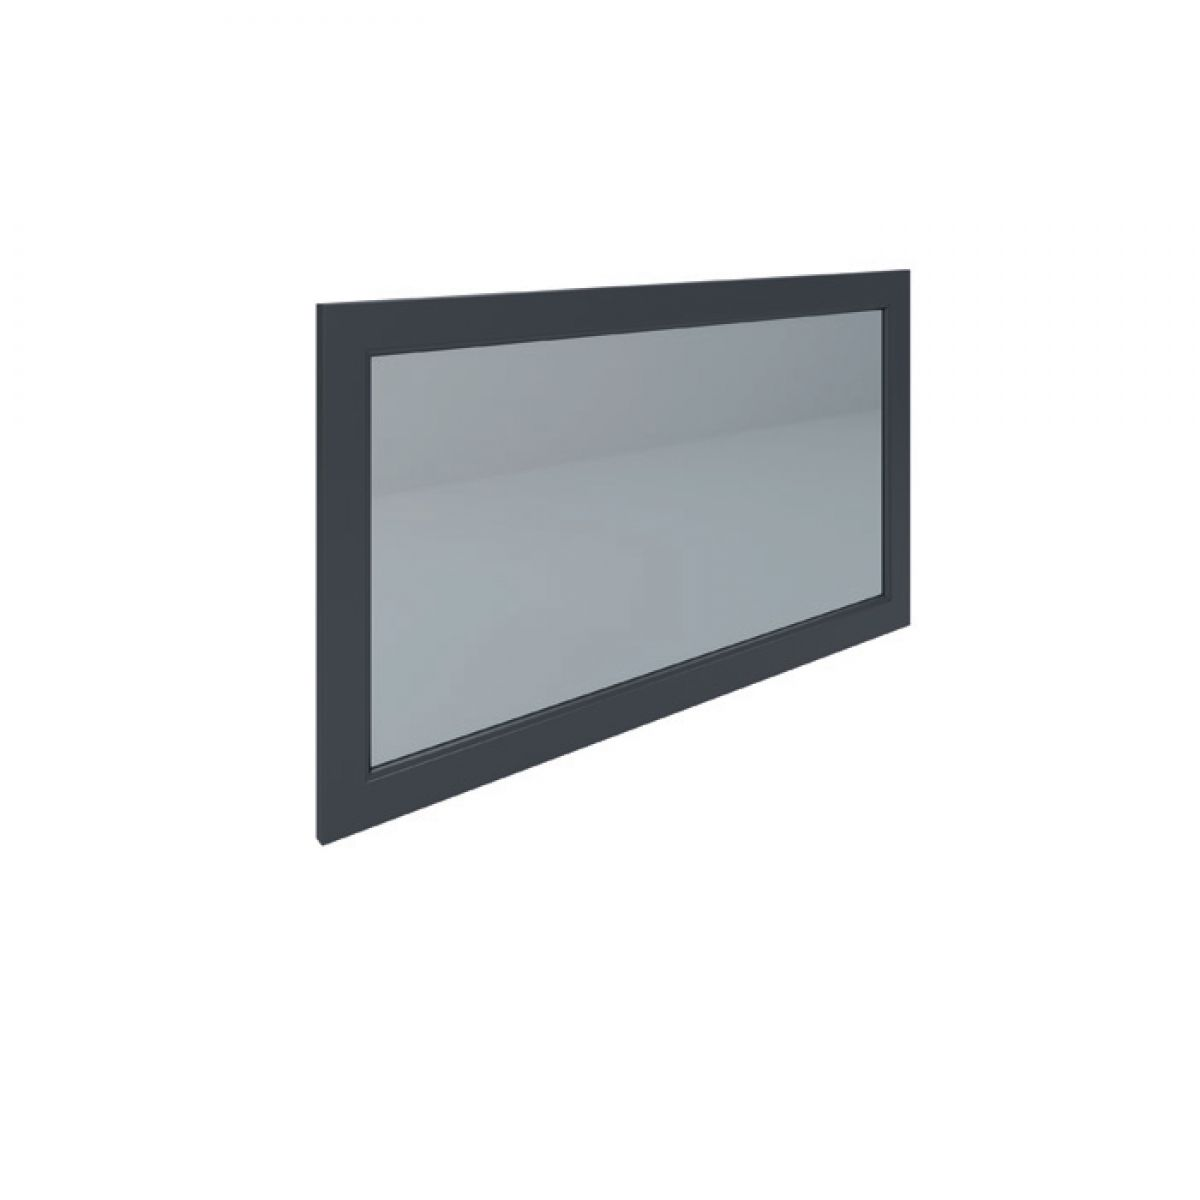 RAK Washington Black Bathroom Mirror 1200mm